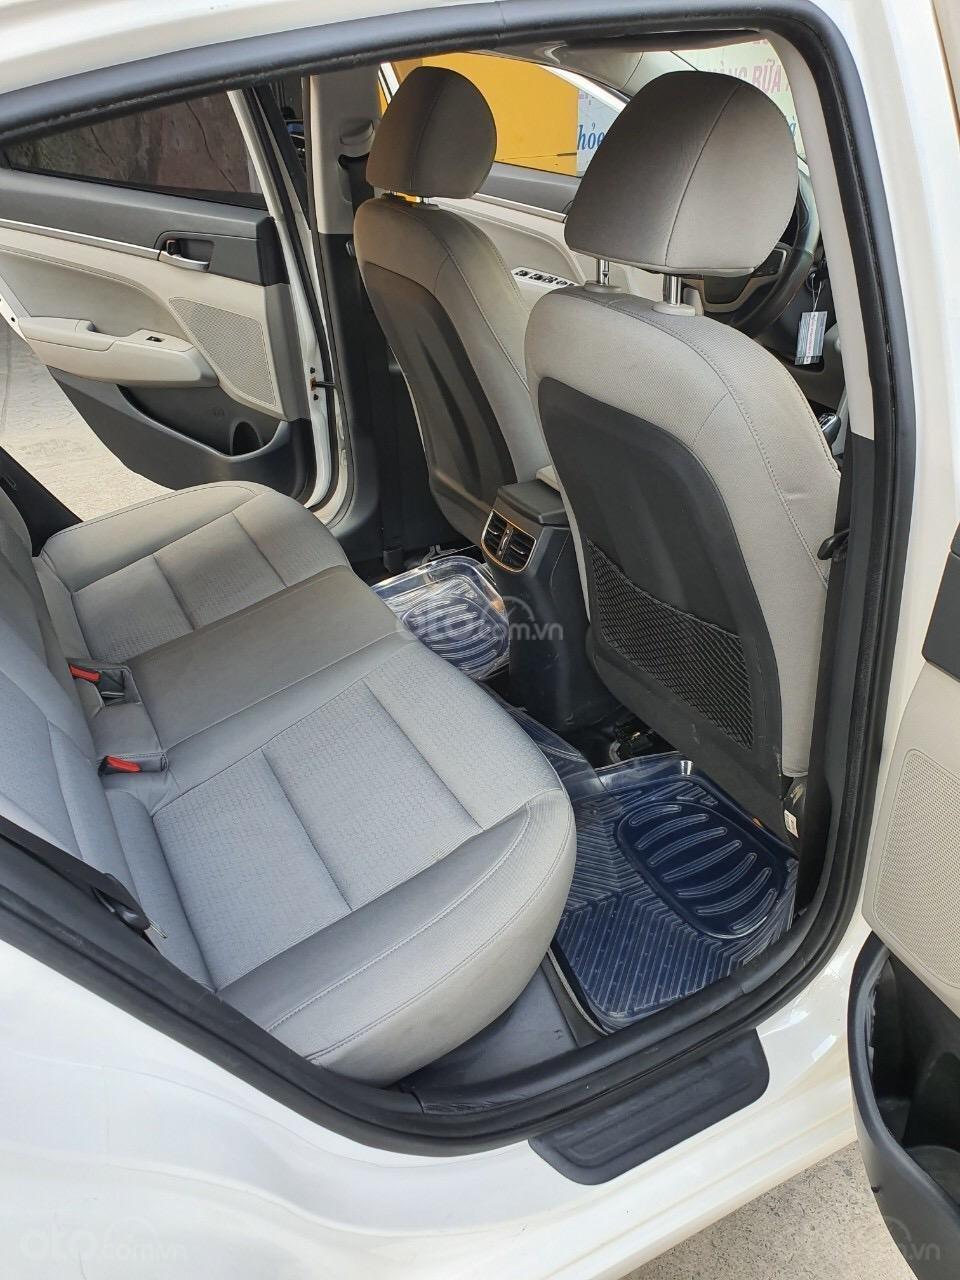 Hyundai Elantra 1.6 MT - 2016 (2)